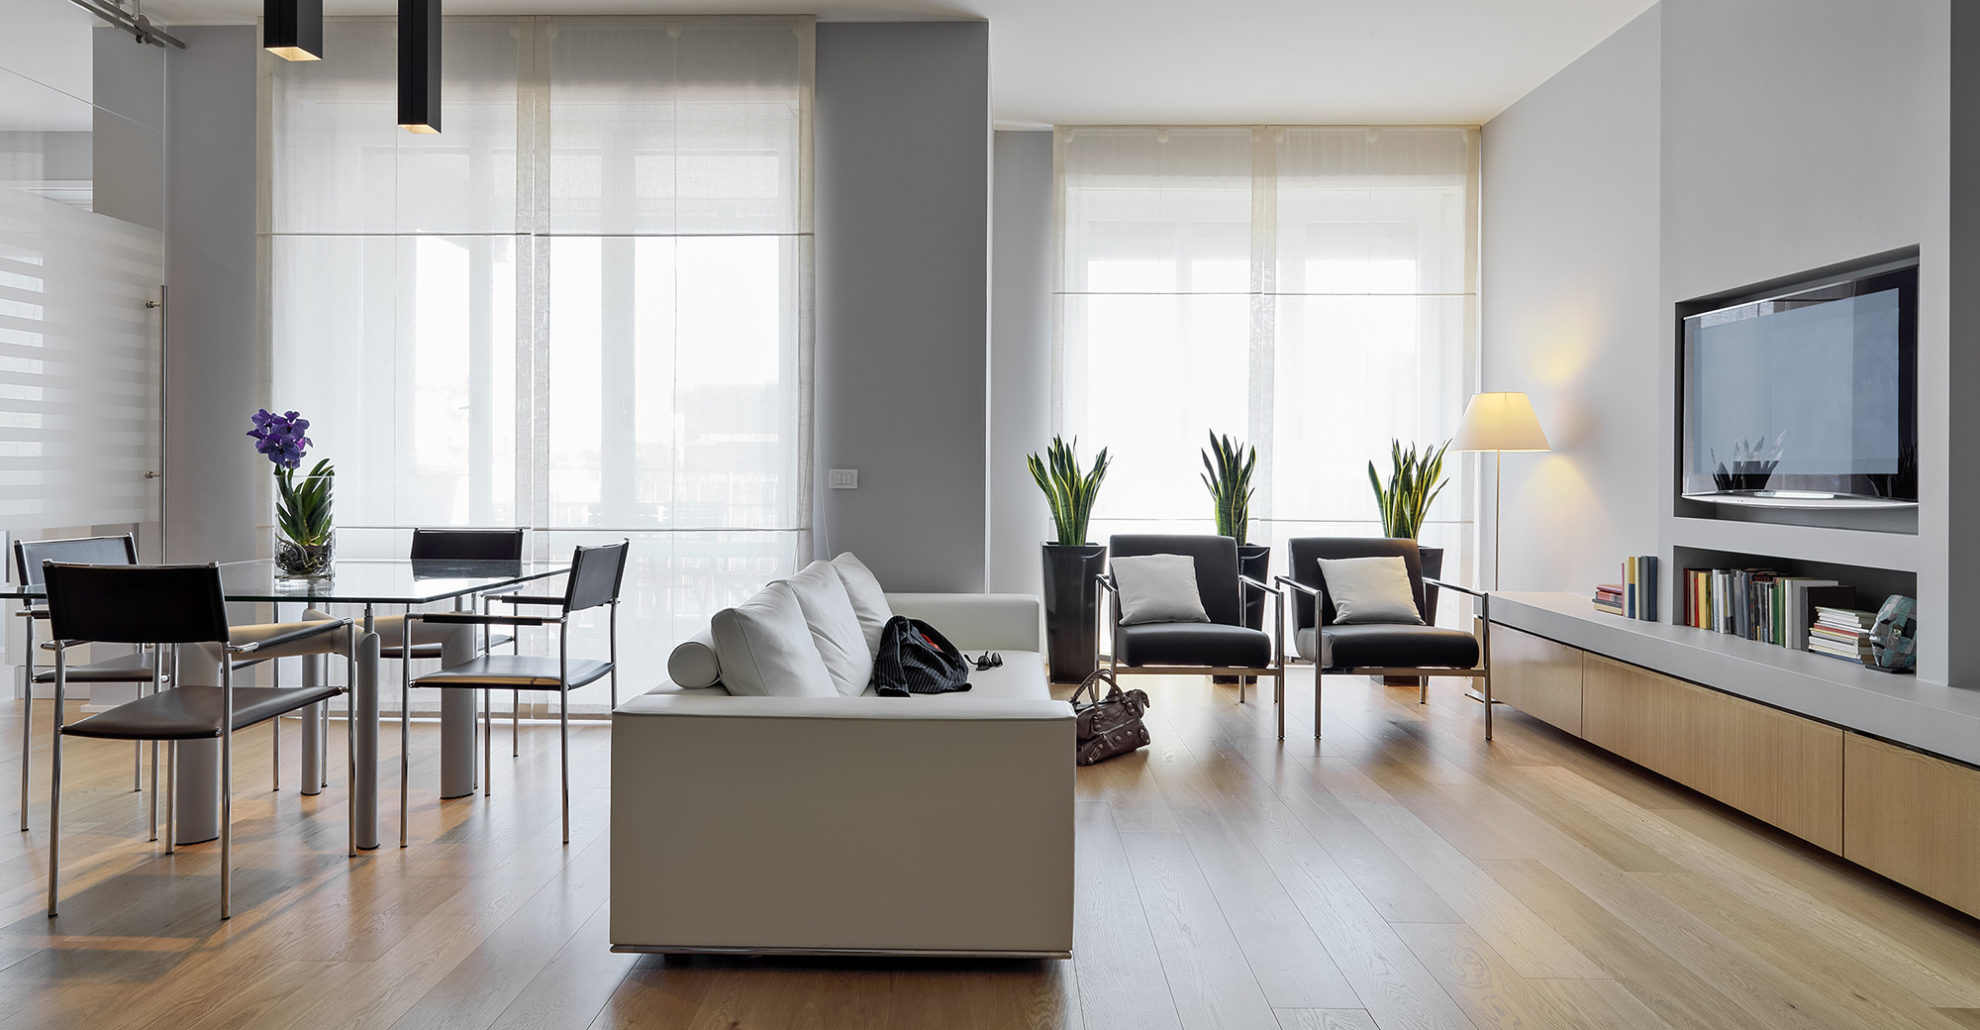 Hardwood Floors, Tufenkian Rugs | Campbell, CA | Van Briggle ...